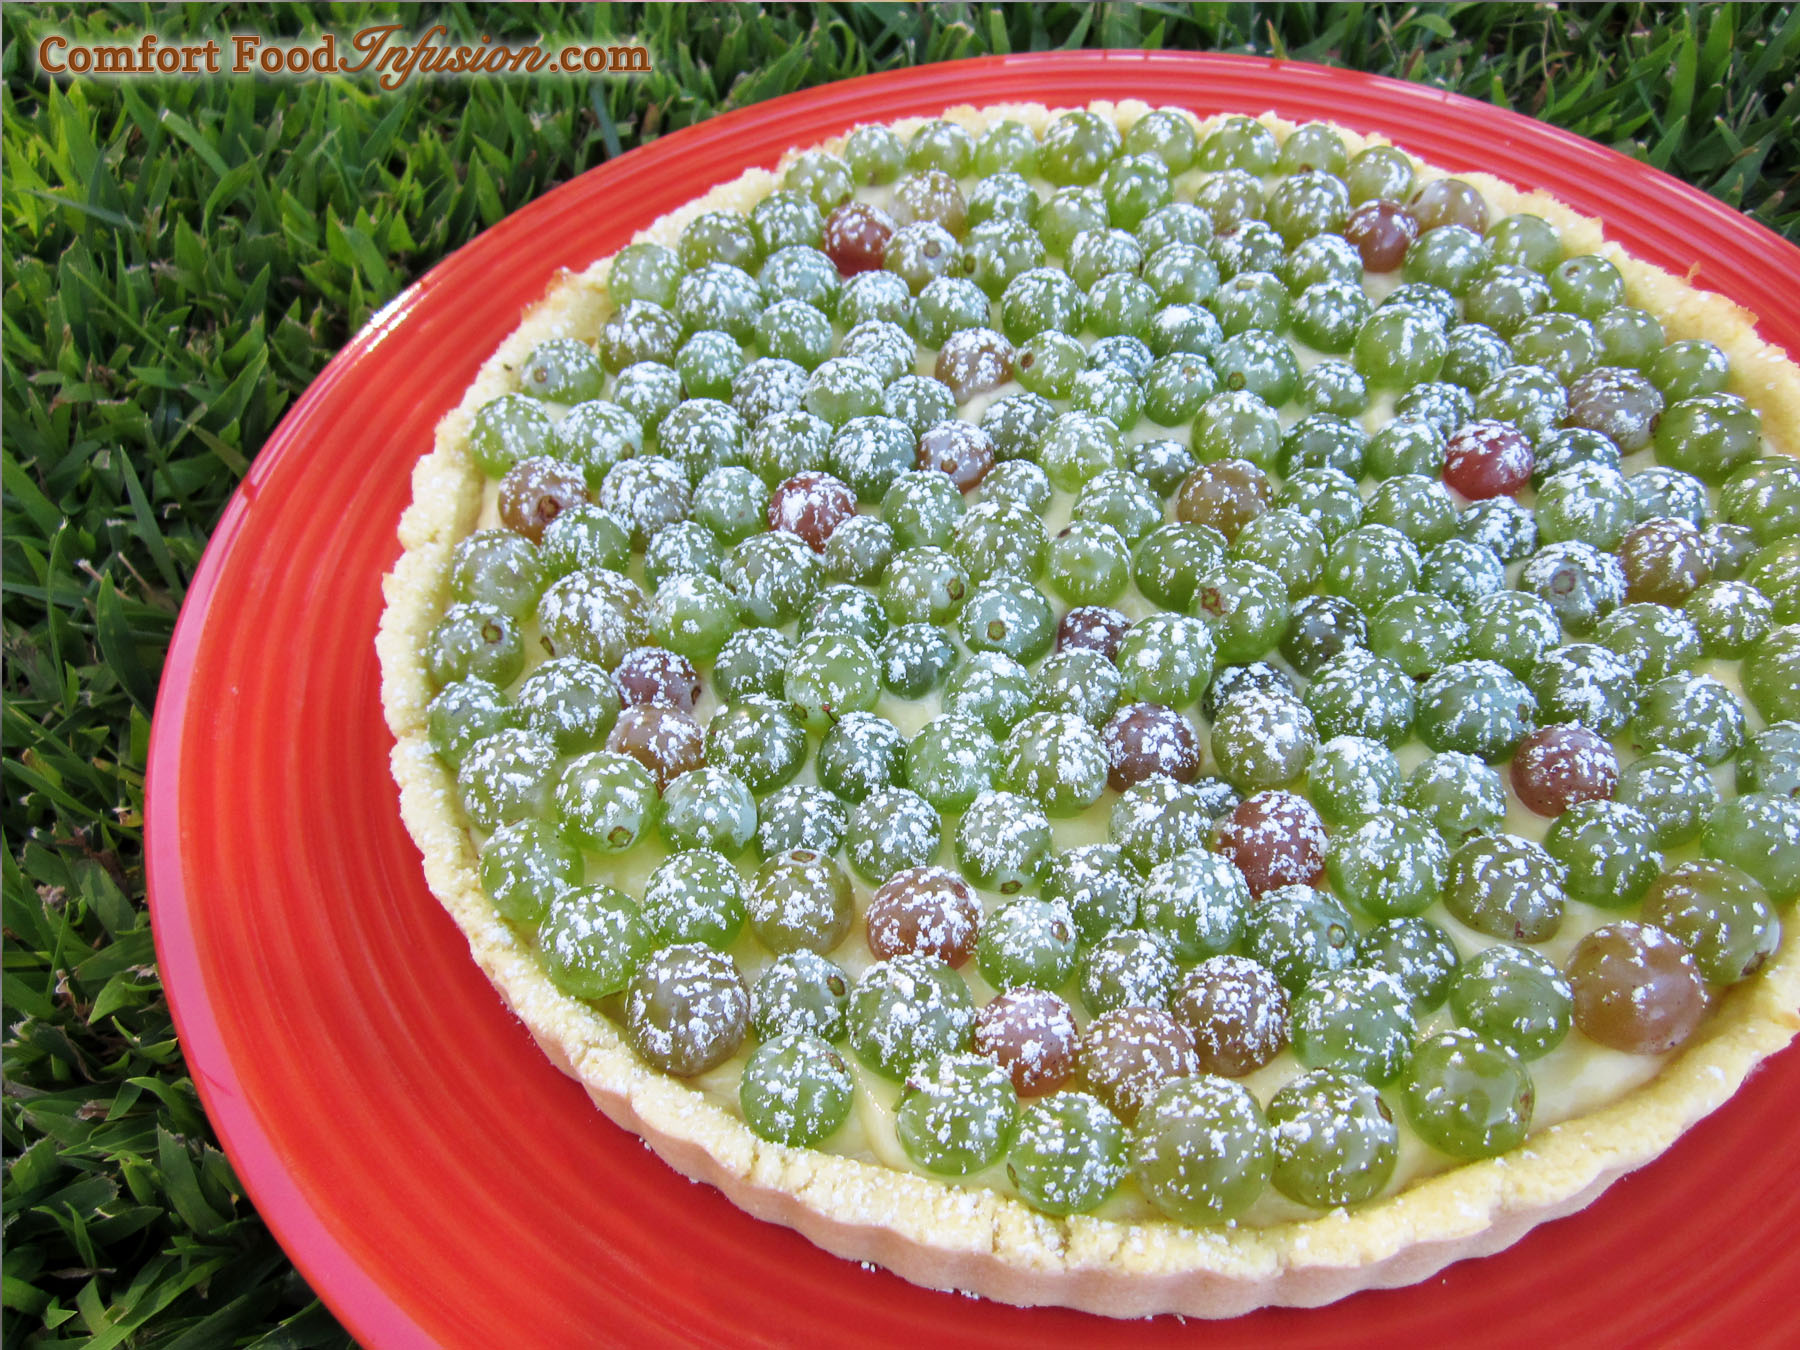 Fresh Fruit Tart - Comfort Food Infusion